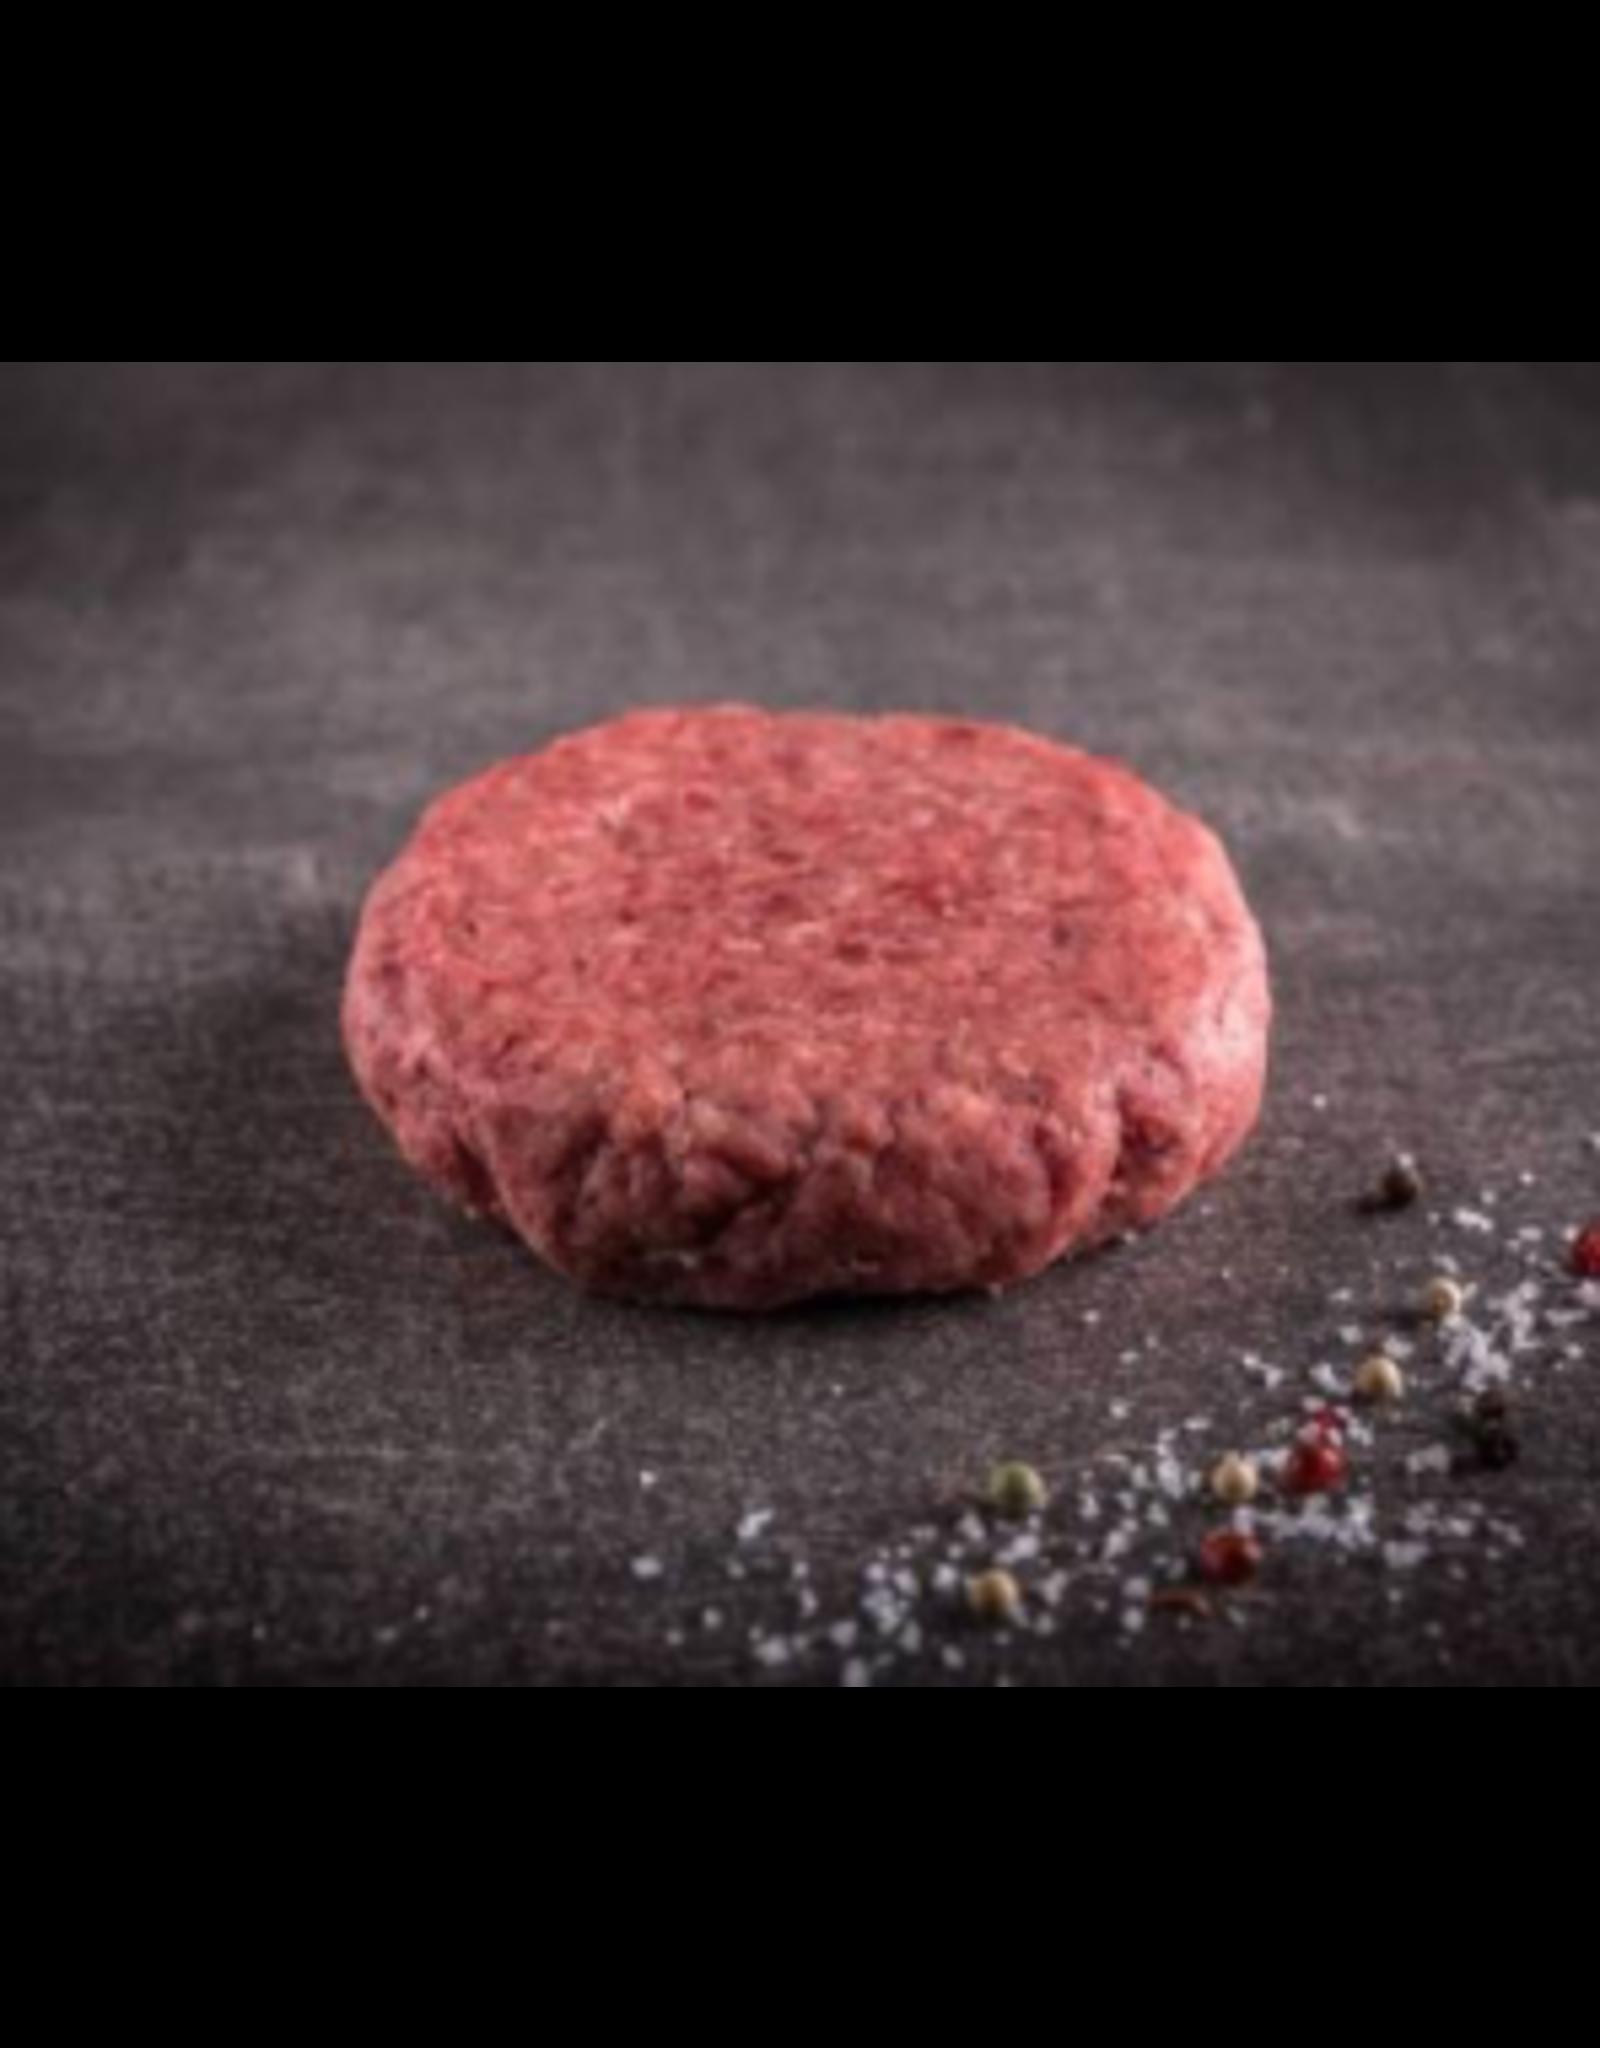 Beyond Burger 2x113g ❄️❄️❄️ - ANGEBOT